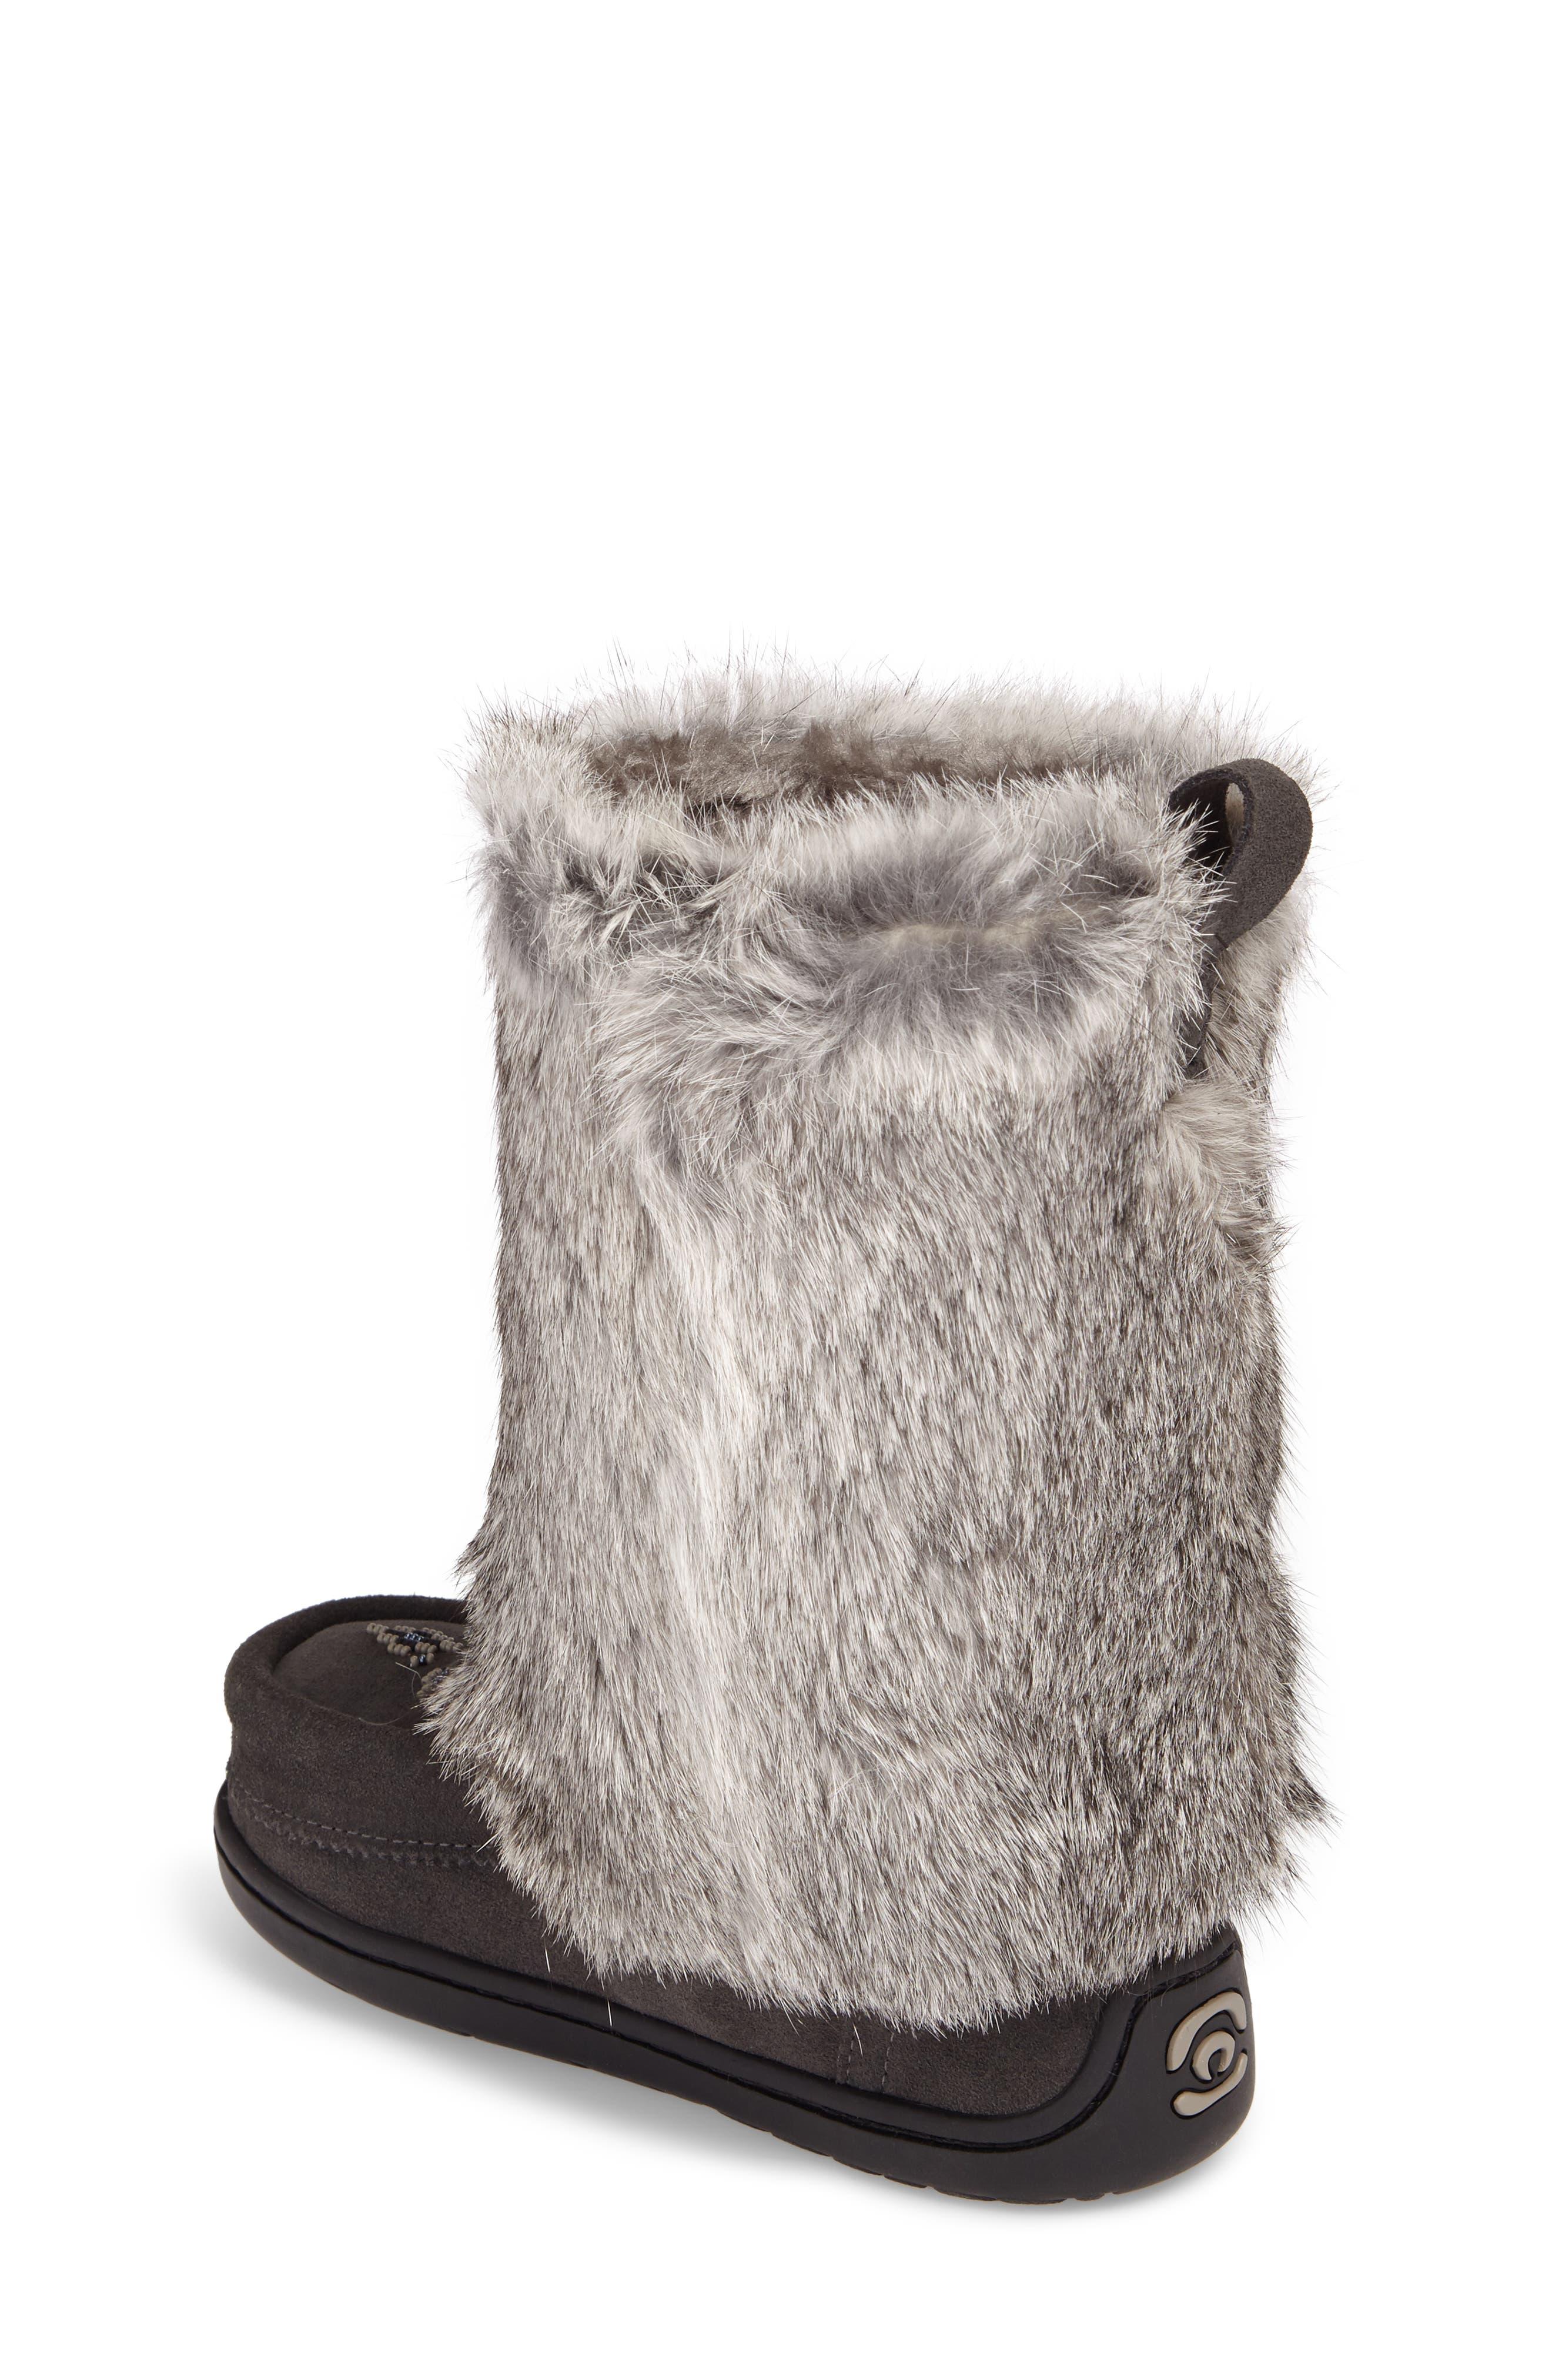 Nordic Genuine Rabbit Fur & Genuine Shearling Mukluk Boot,                             Alternate thumbnail 2, color,                             021